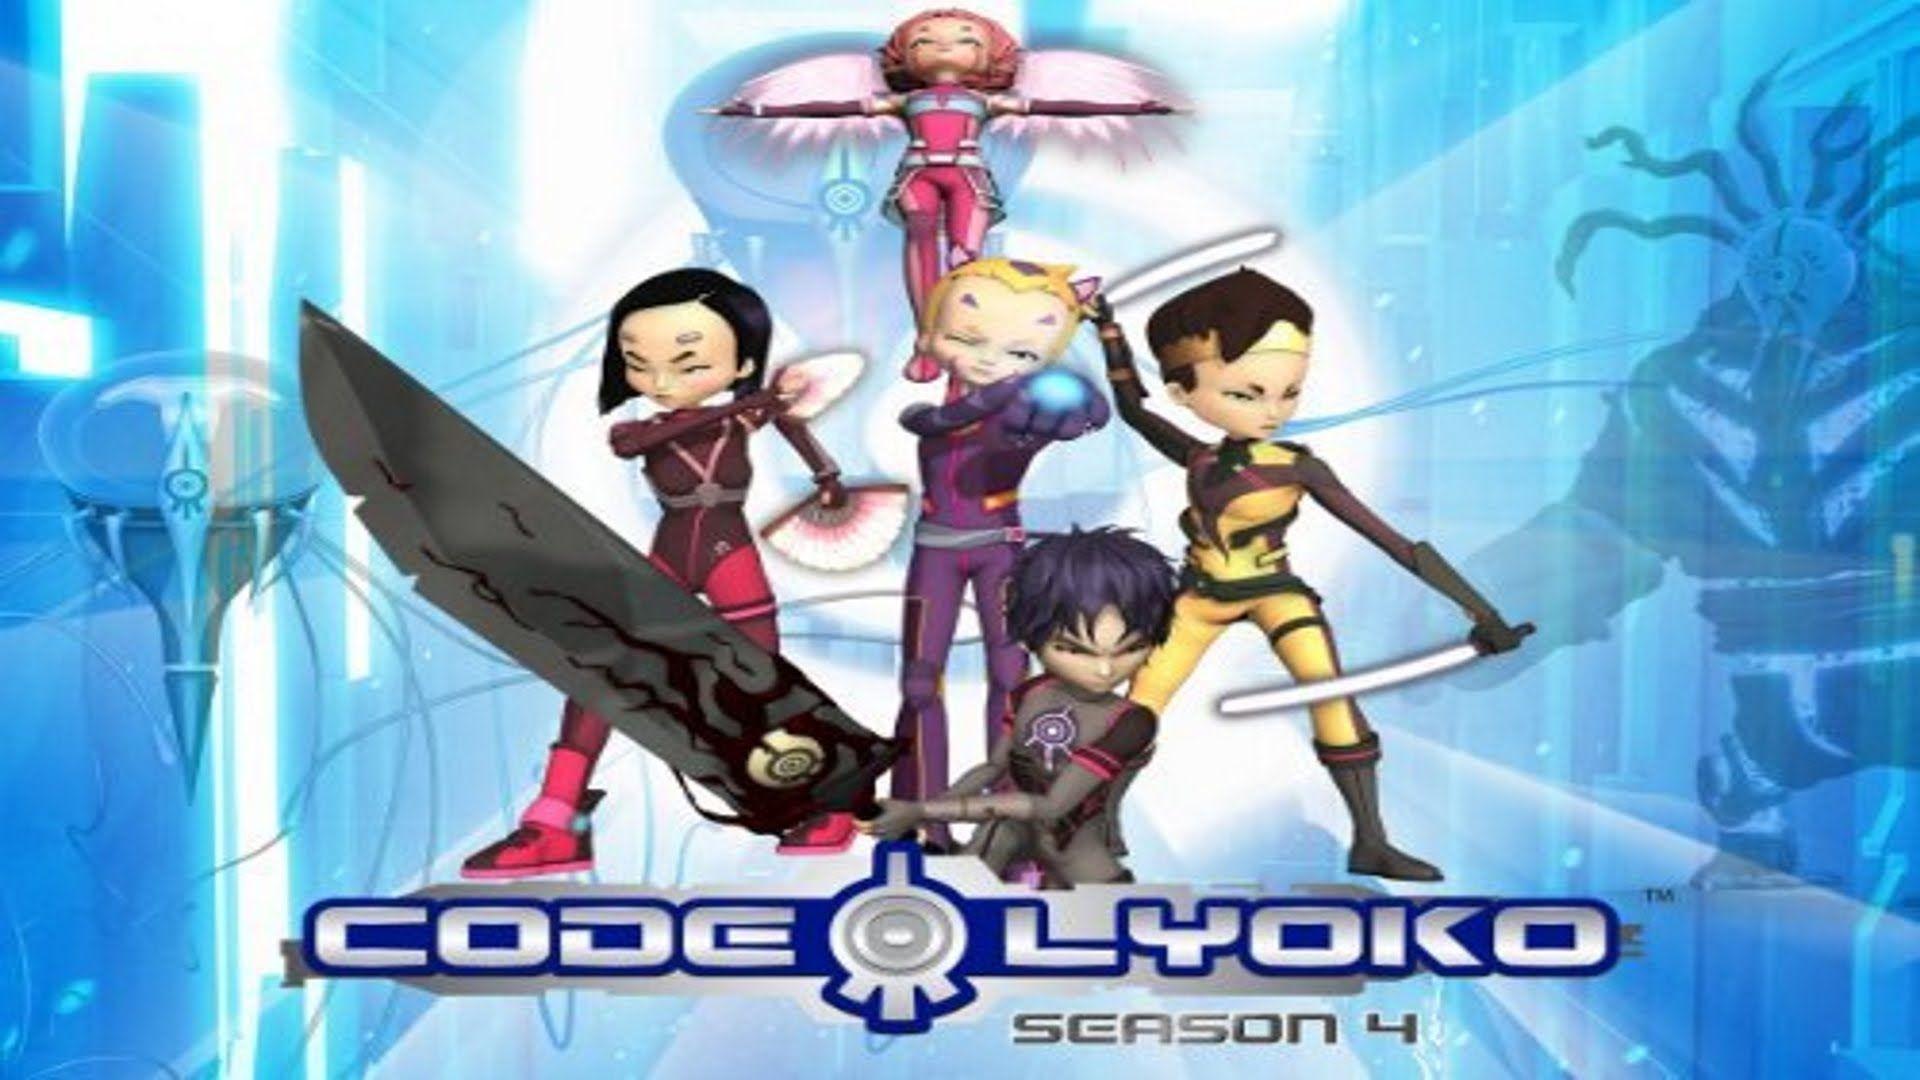 Code Lyoko Season 4 Episode 77 Lost of Sea Code lyoko